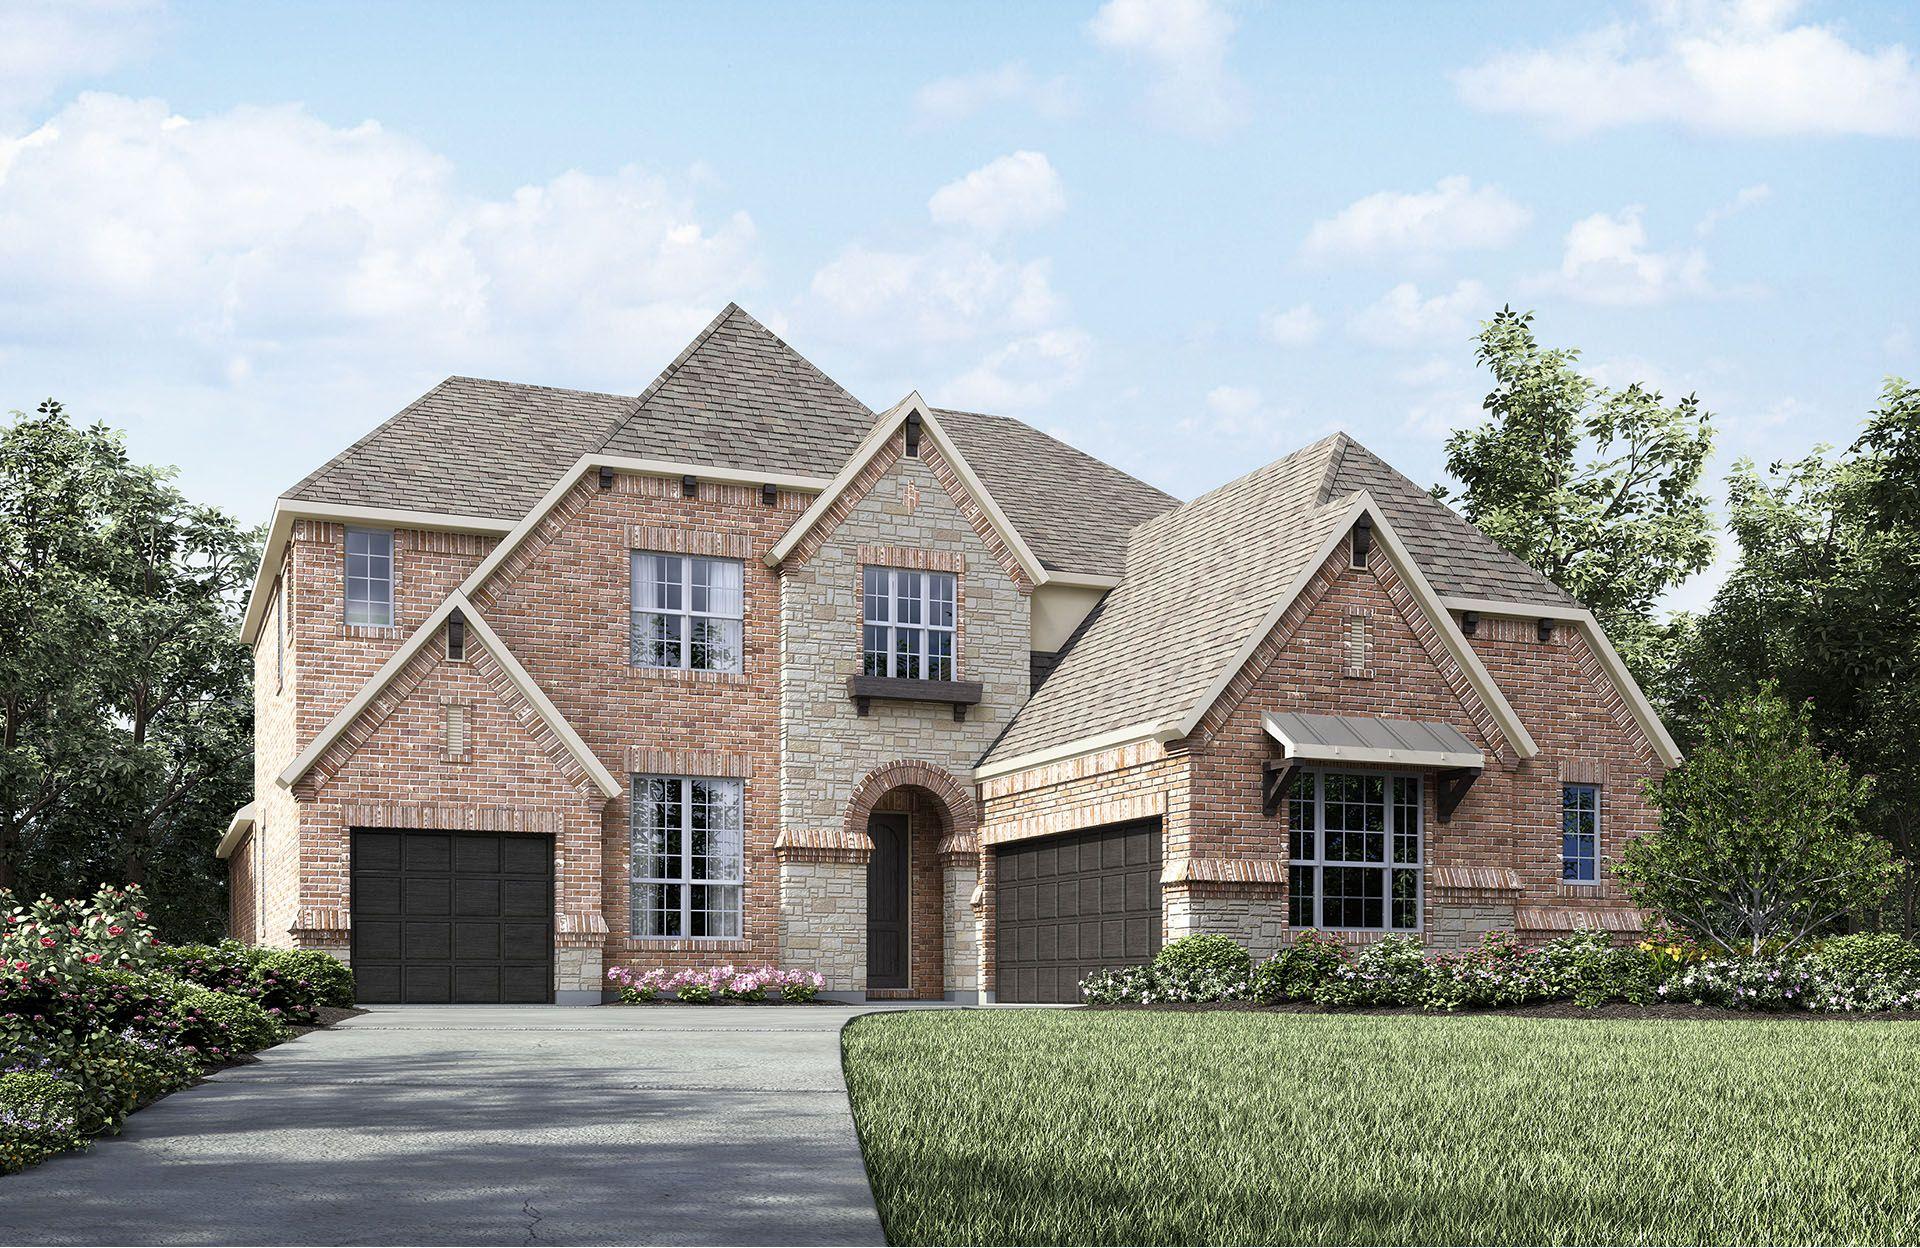 Single Family for Active at Viridian - Bracken Iii 1344 Viridian Park Lane Arlington, Texas 76005 United States